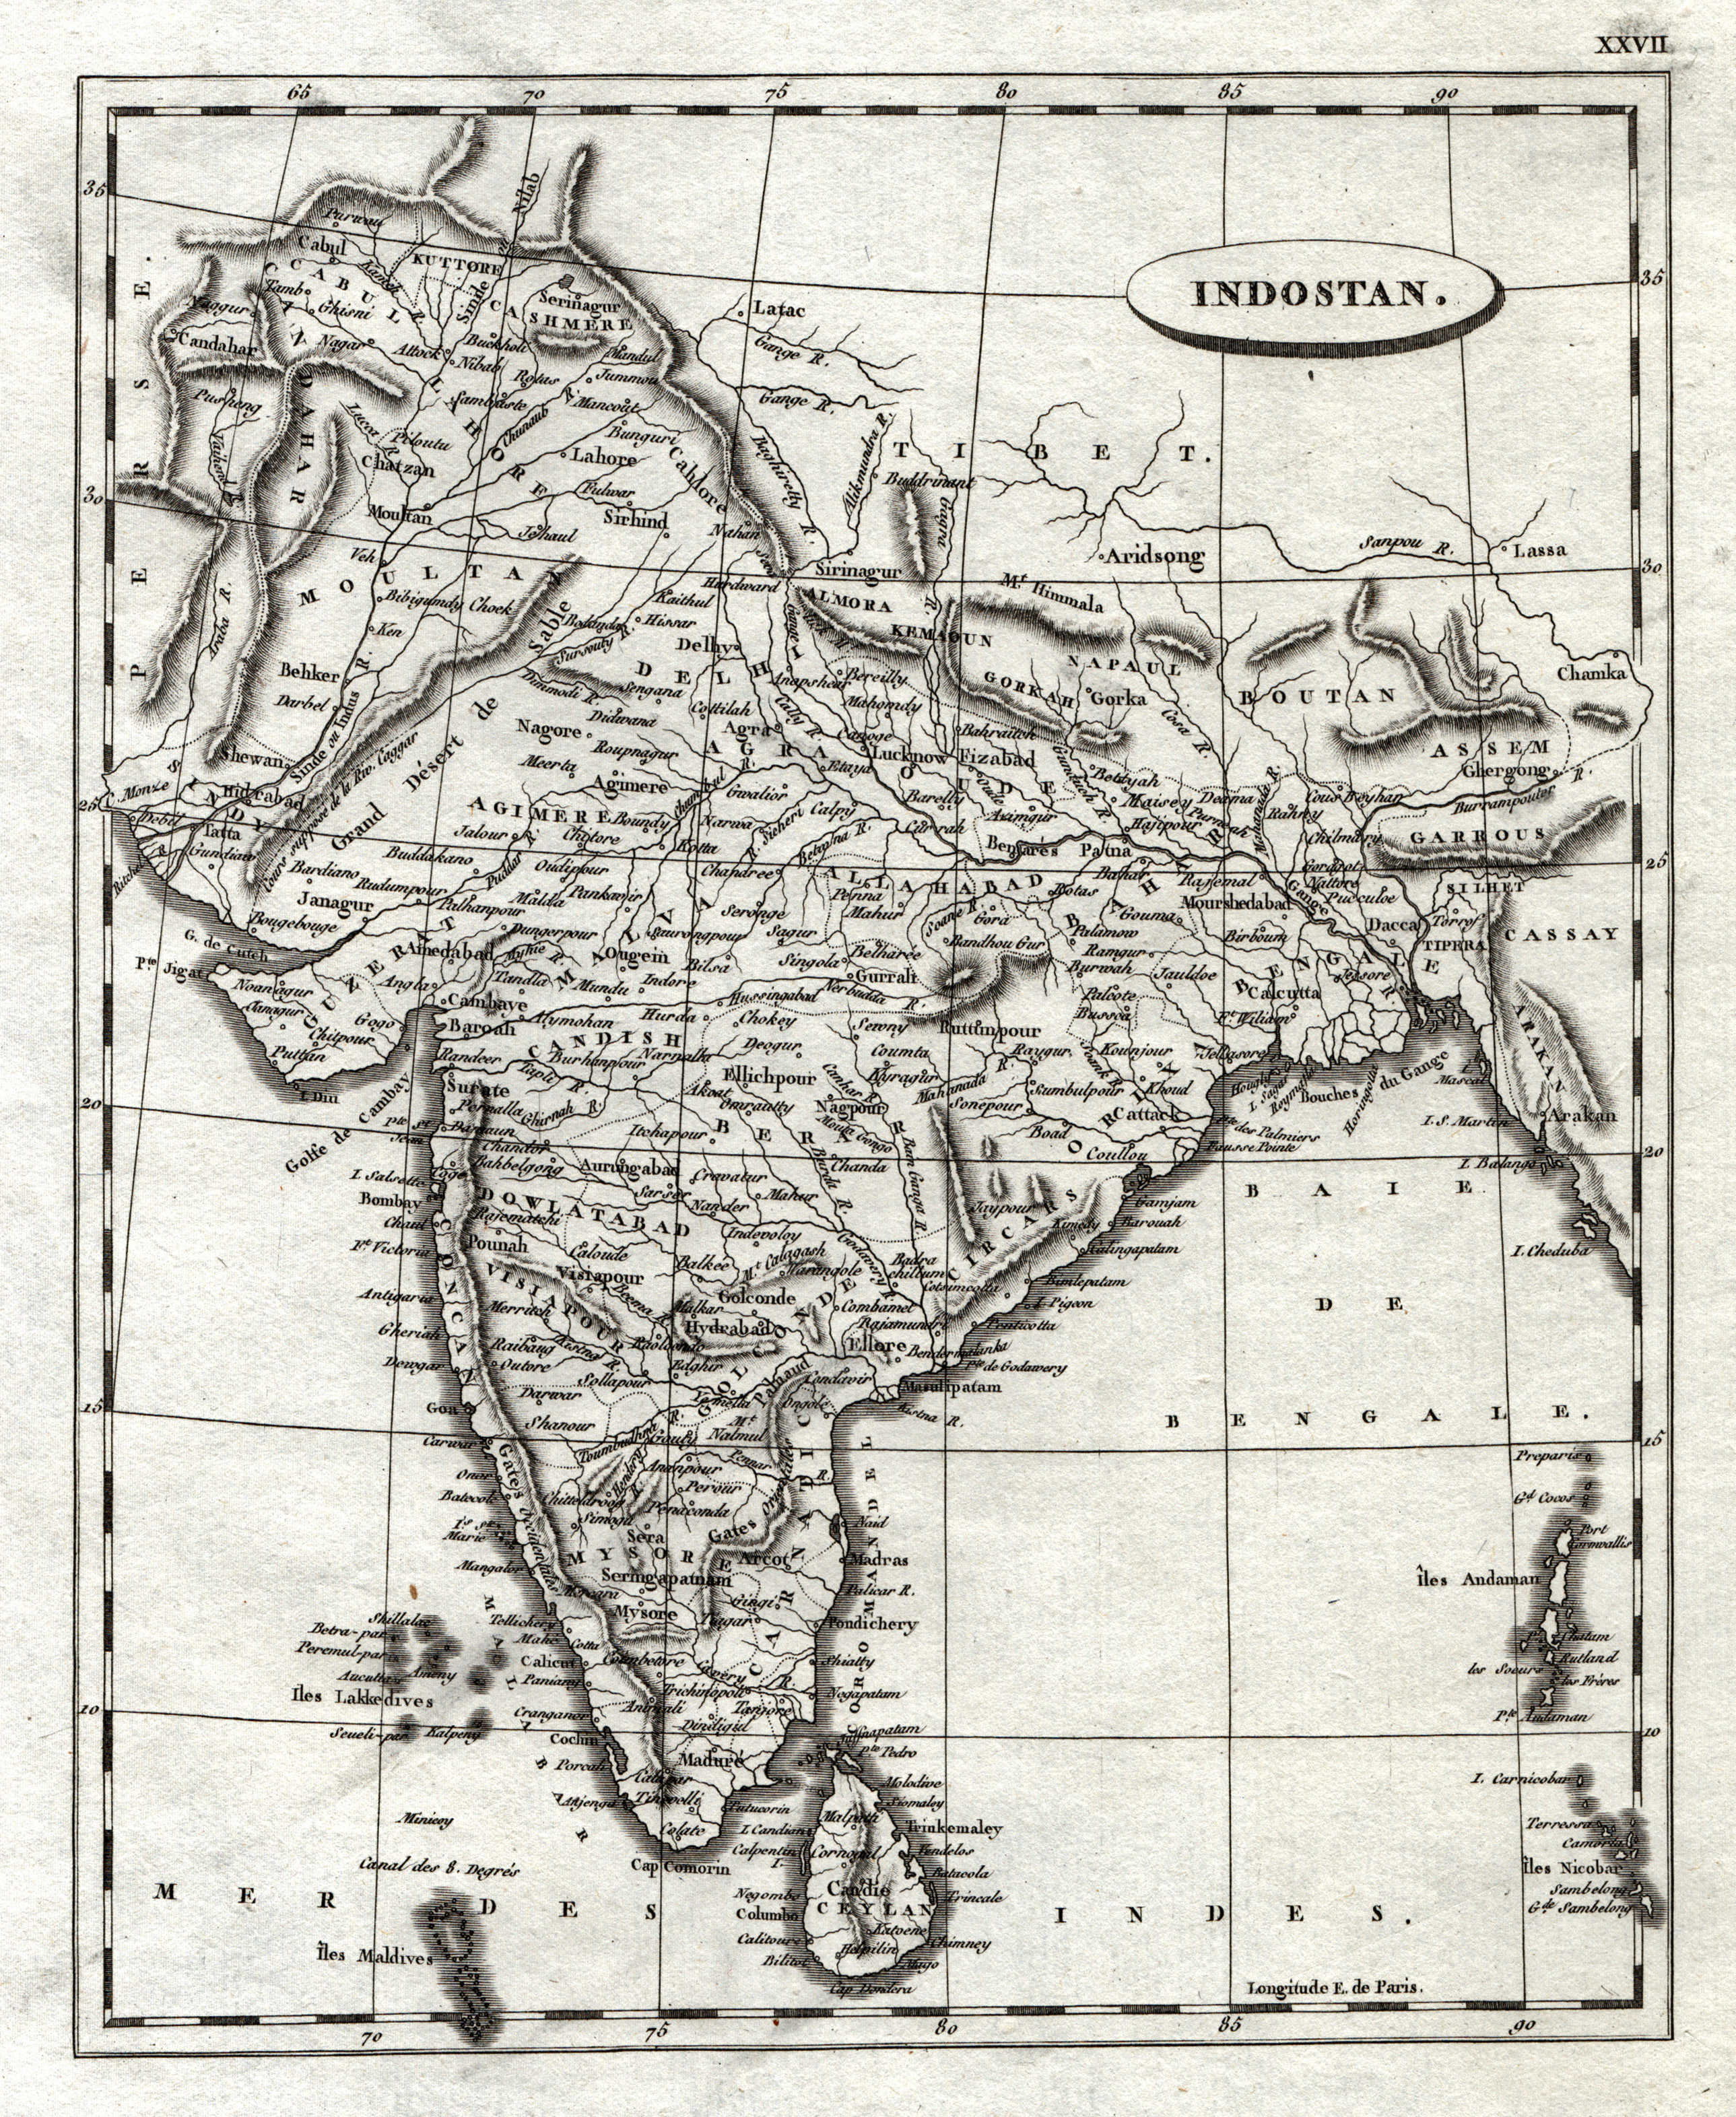 Kst.- Karte, n. Arrowsmith u. Buache aus: Indien ( India